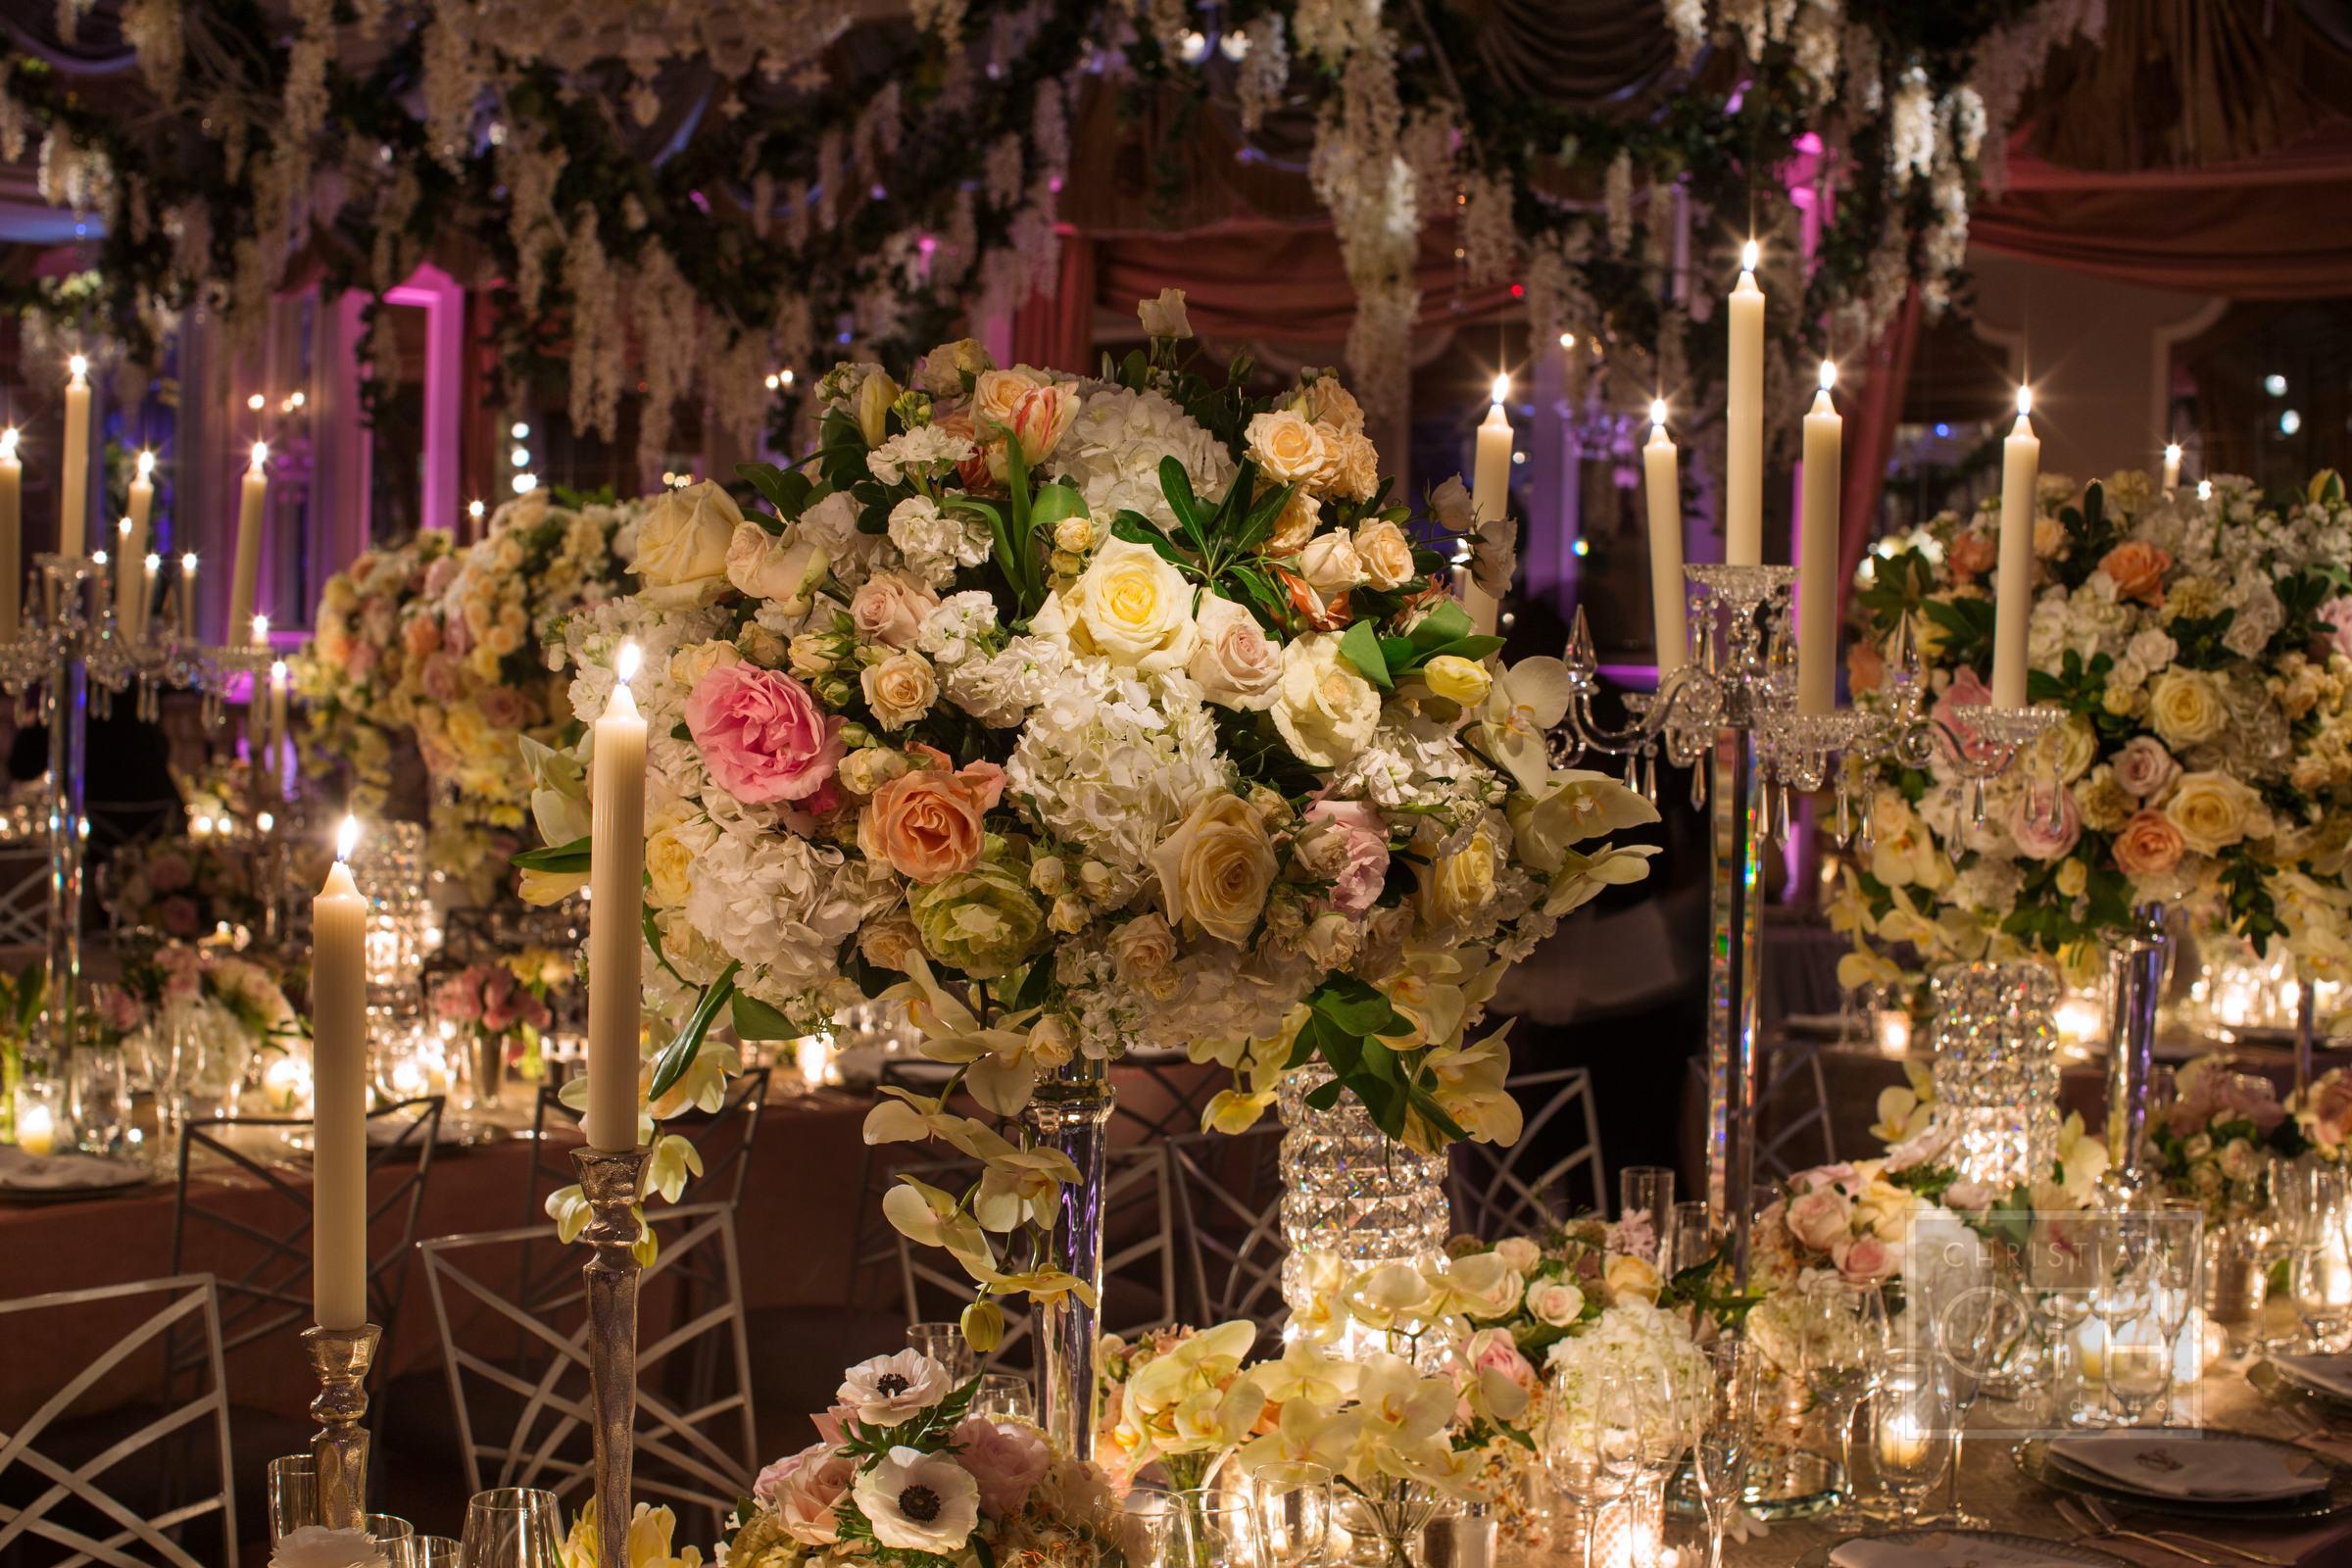 Ceci_New_York_Custom_Invitation_Pierre__City_ Destination_Wedding_Luxury_Personalized_Ceci_Style_Bride_Rose_Gold_Foil_Stamping127.JPG